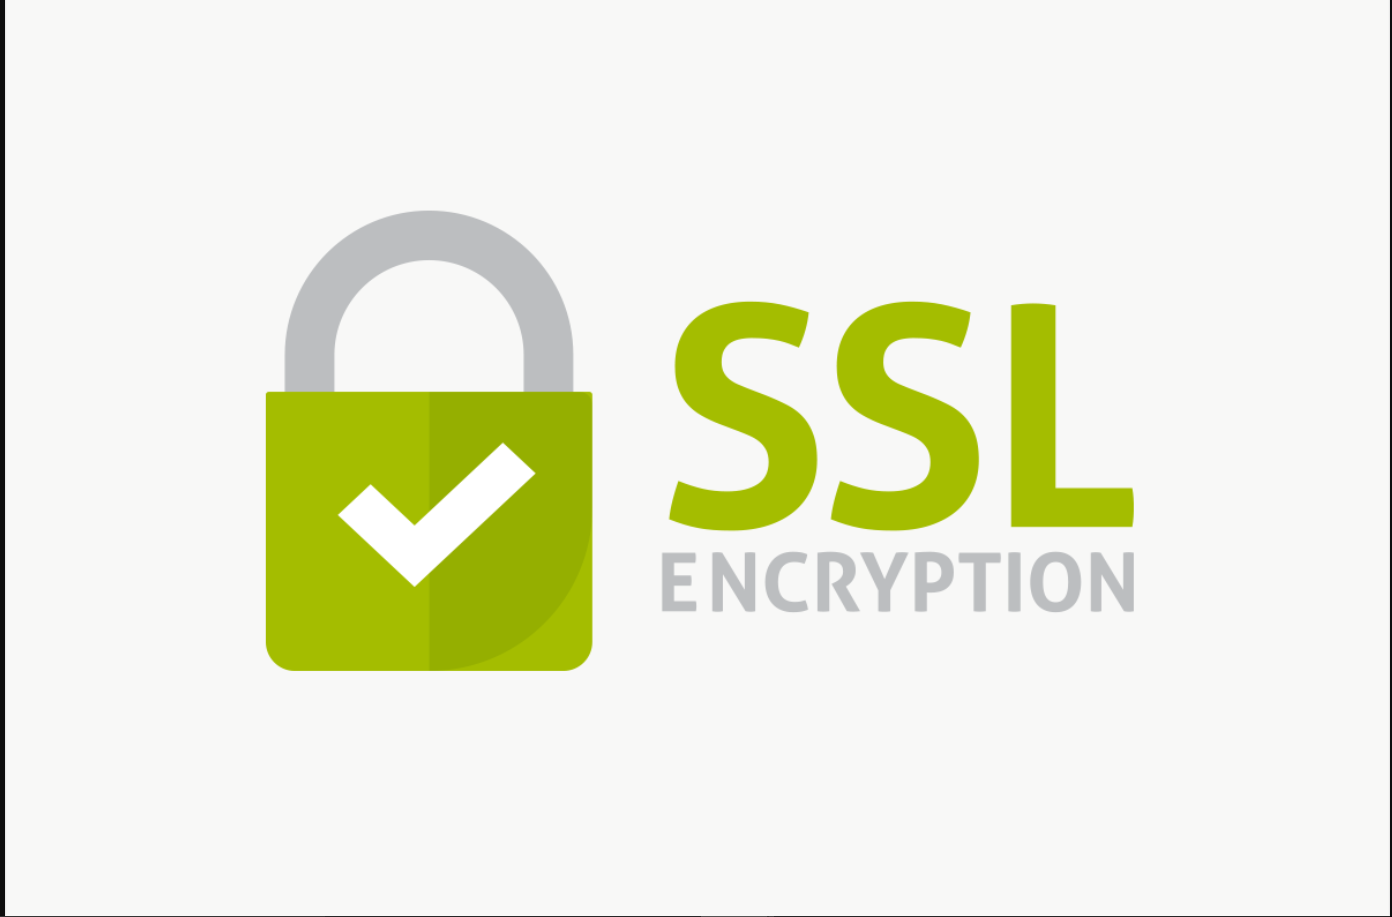 SSL certification for Wordpress site in 2 hours